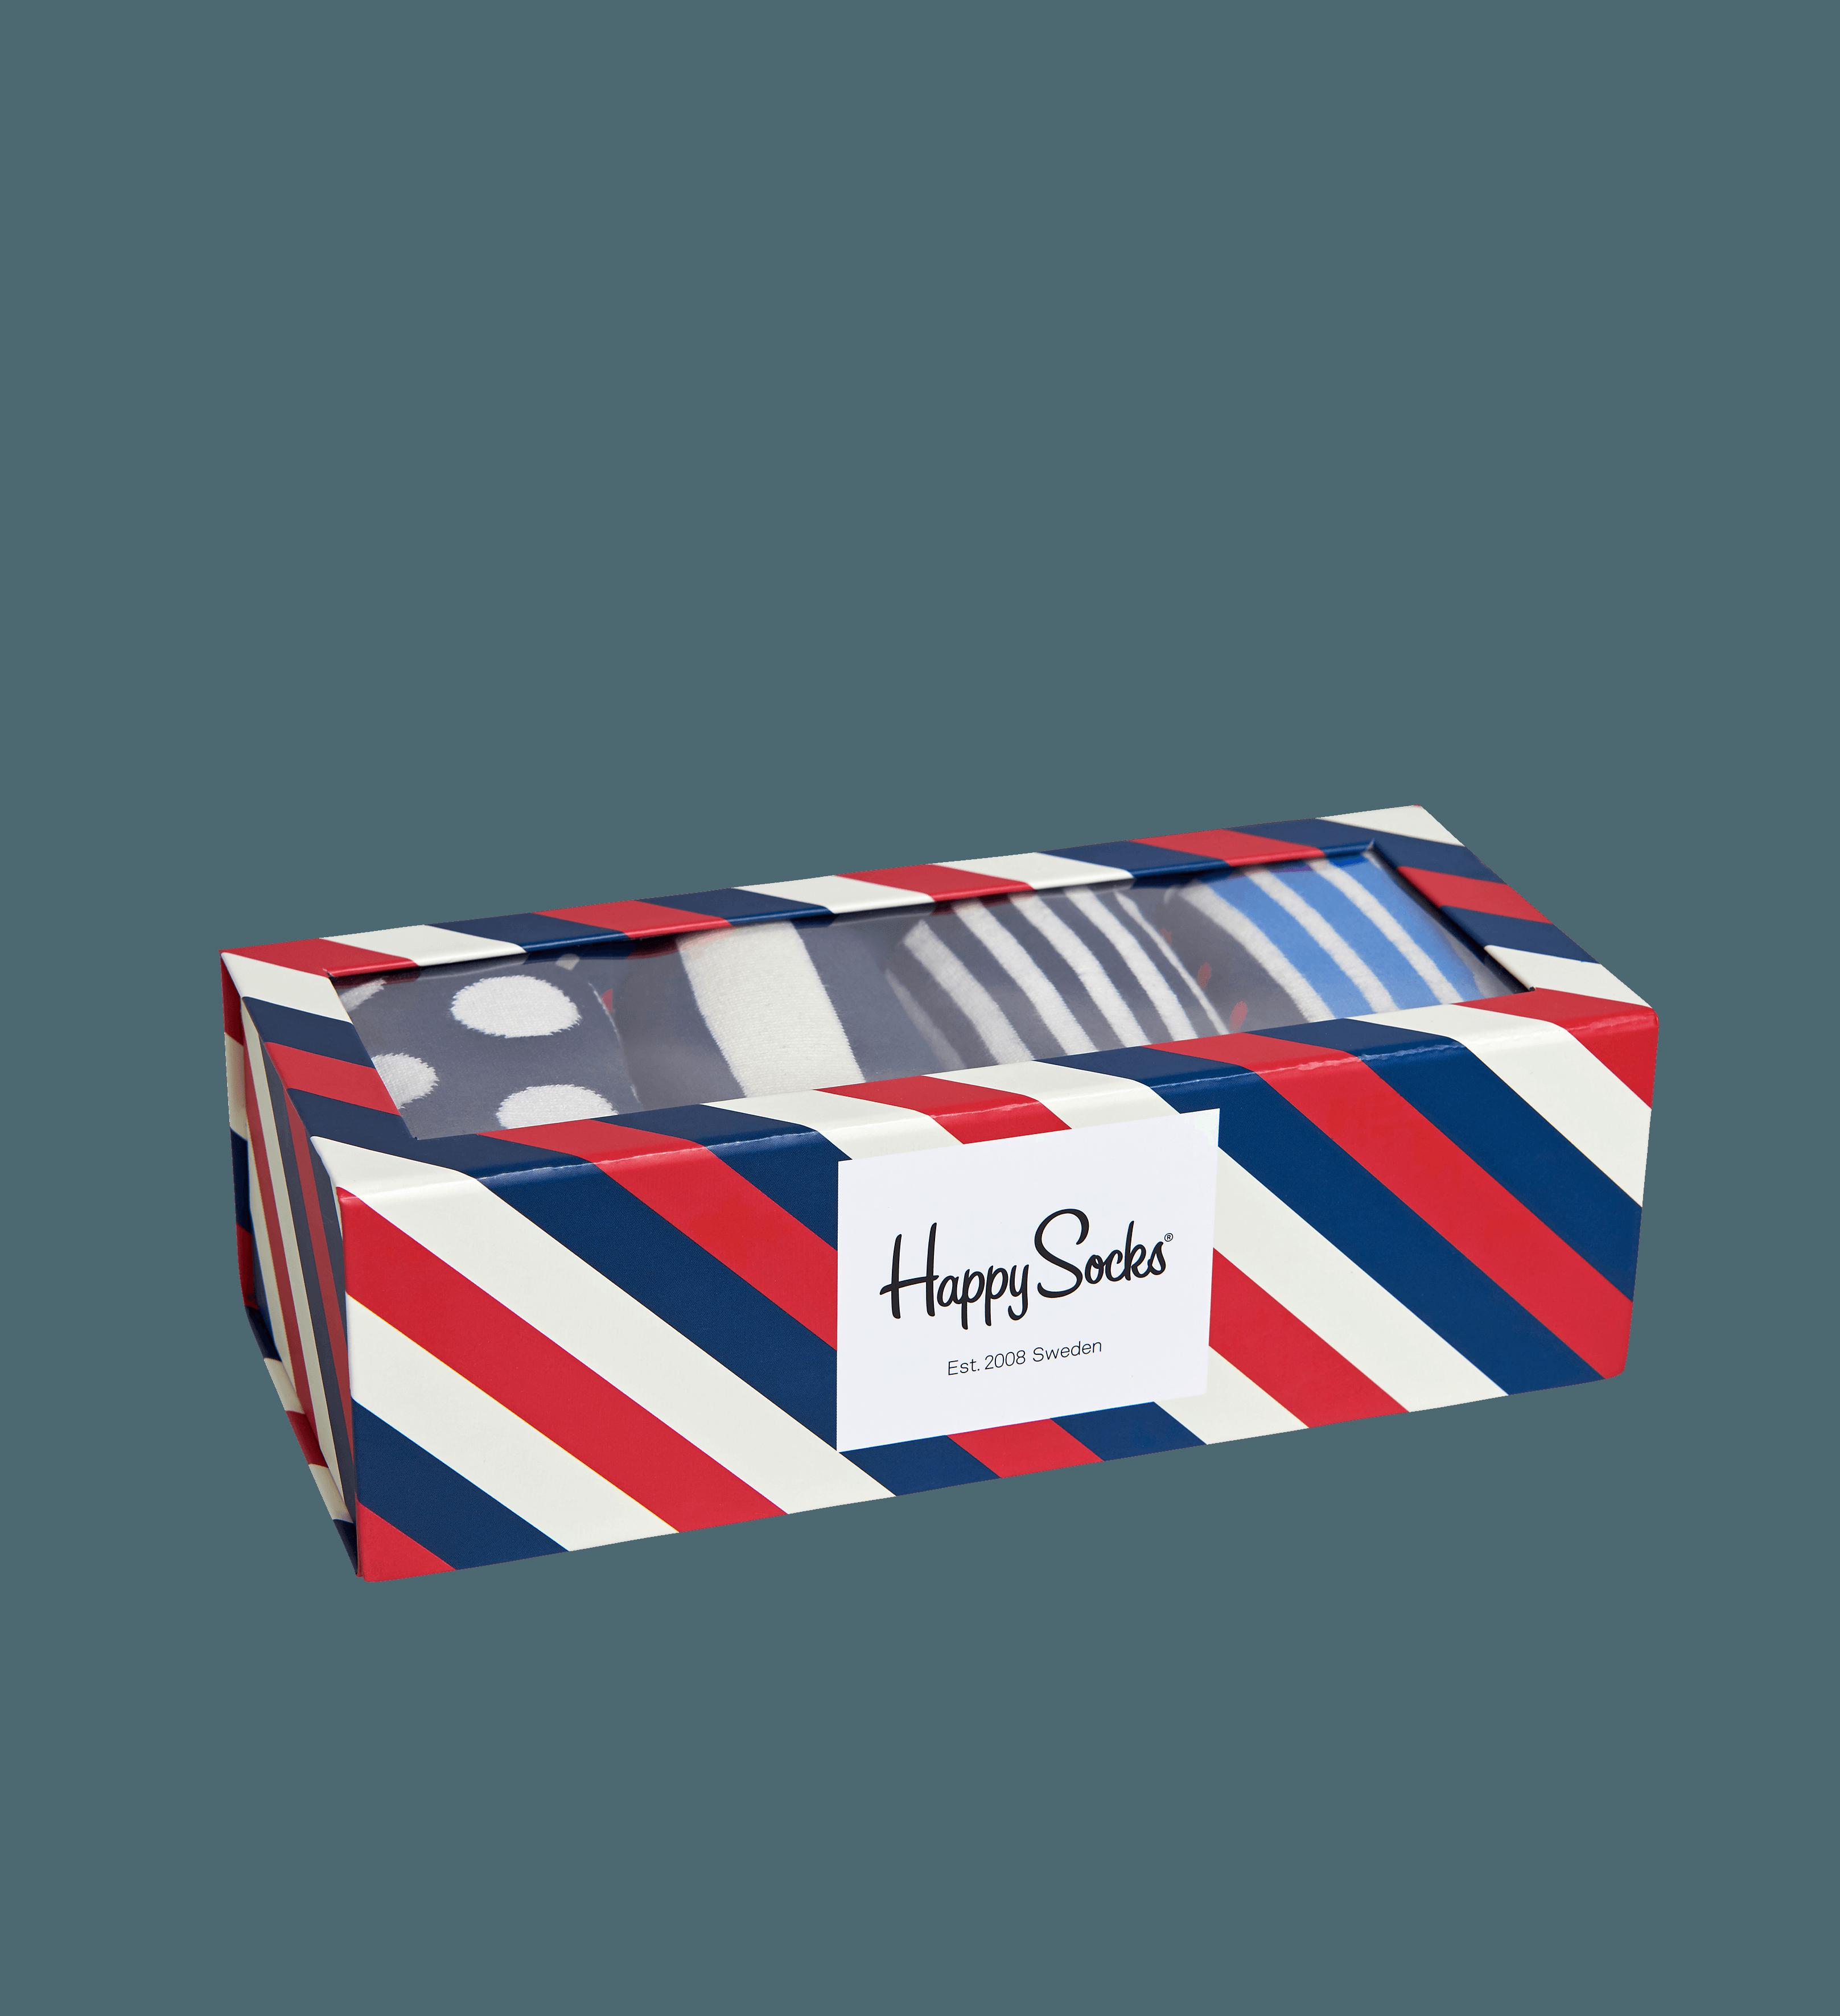 happy socks female stripe womens socks gift box size 911